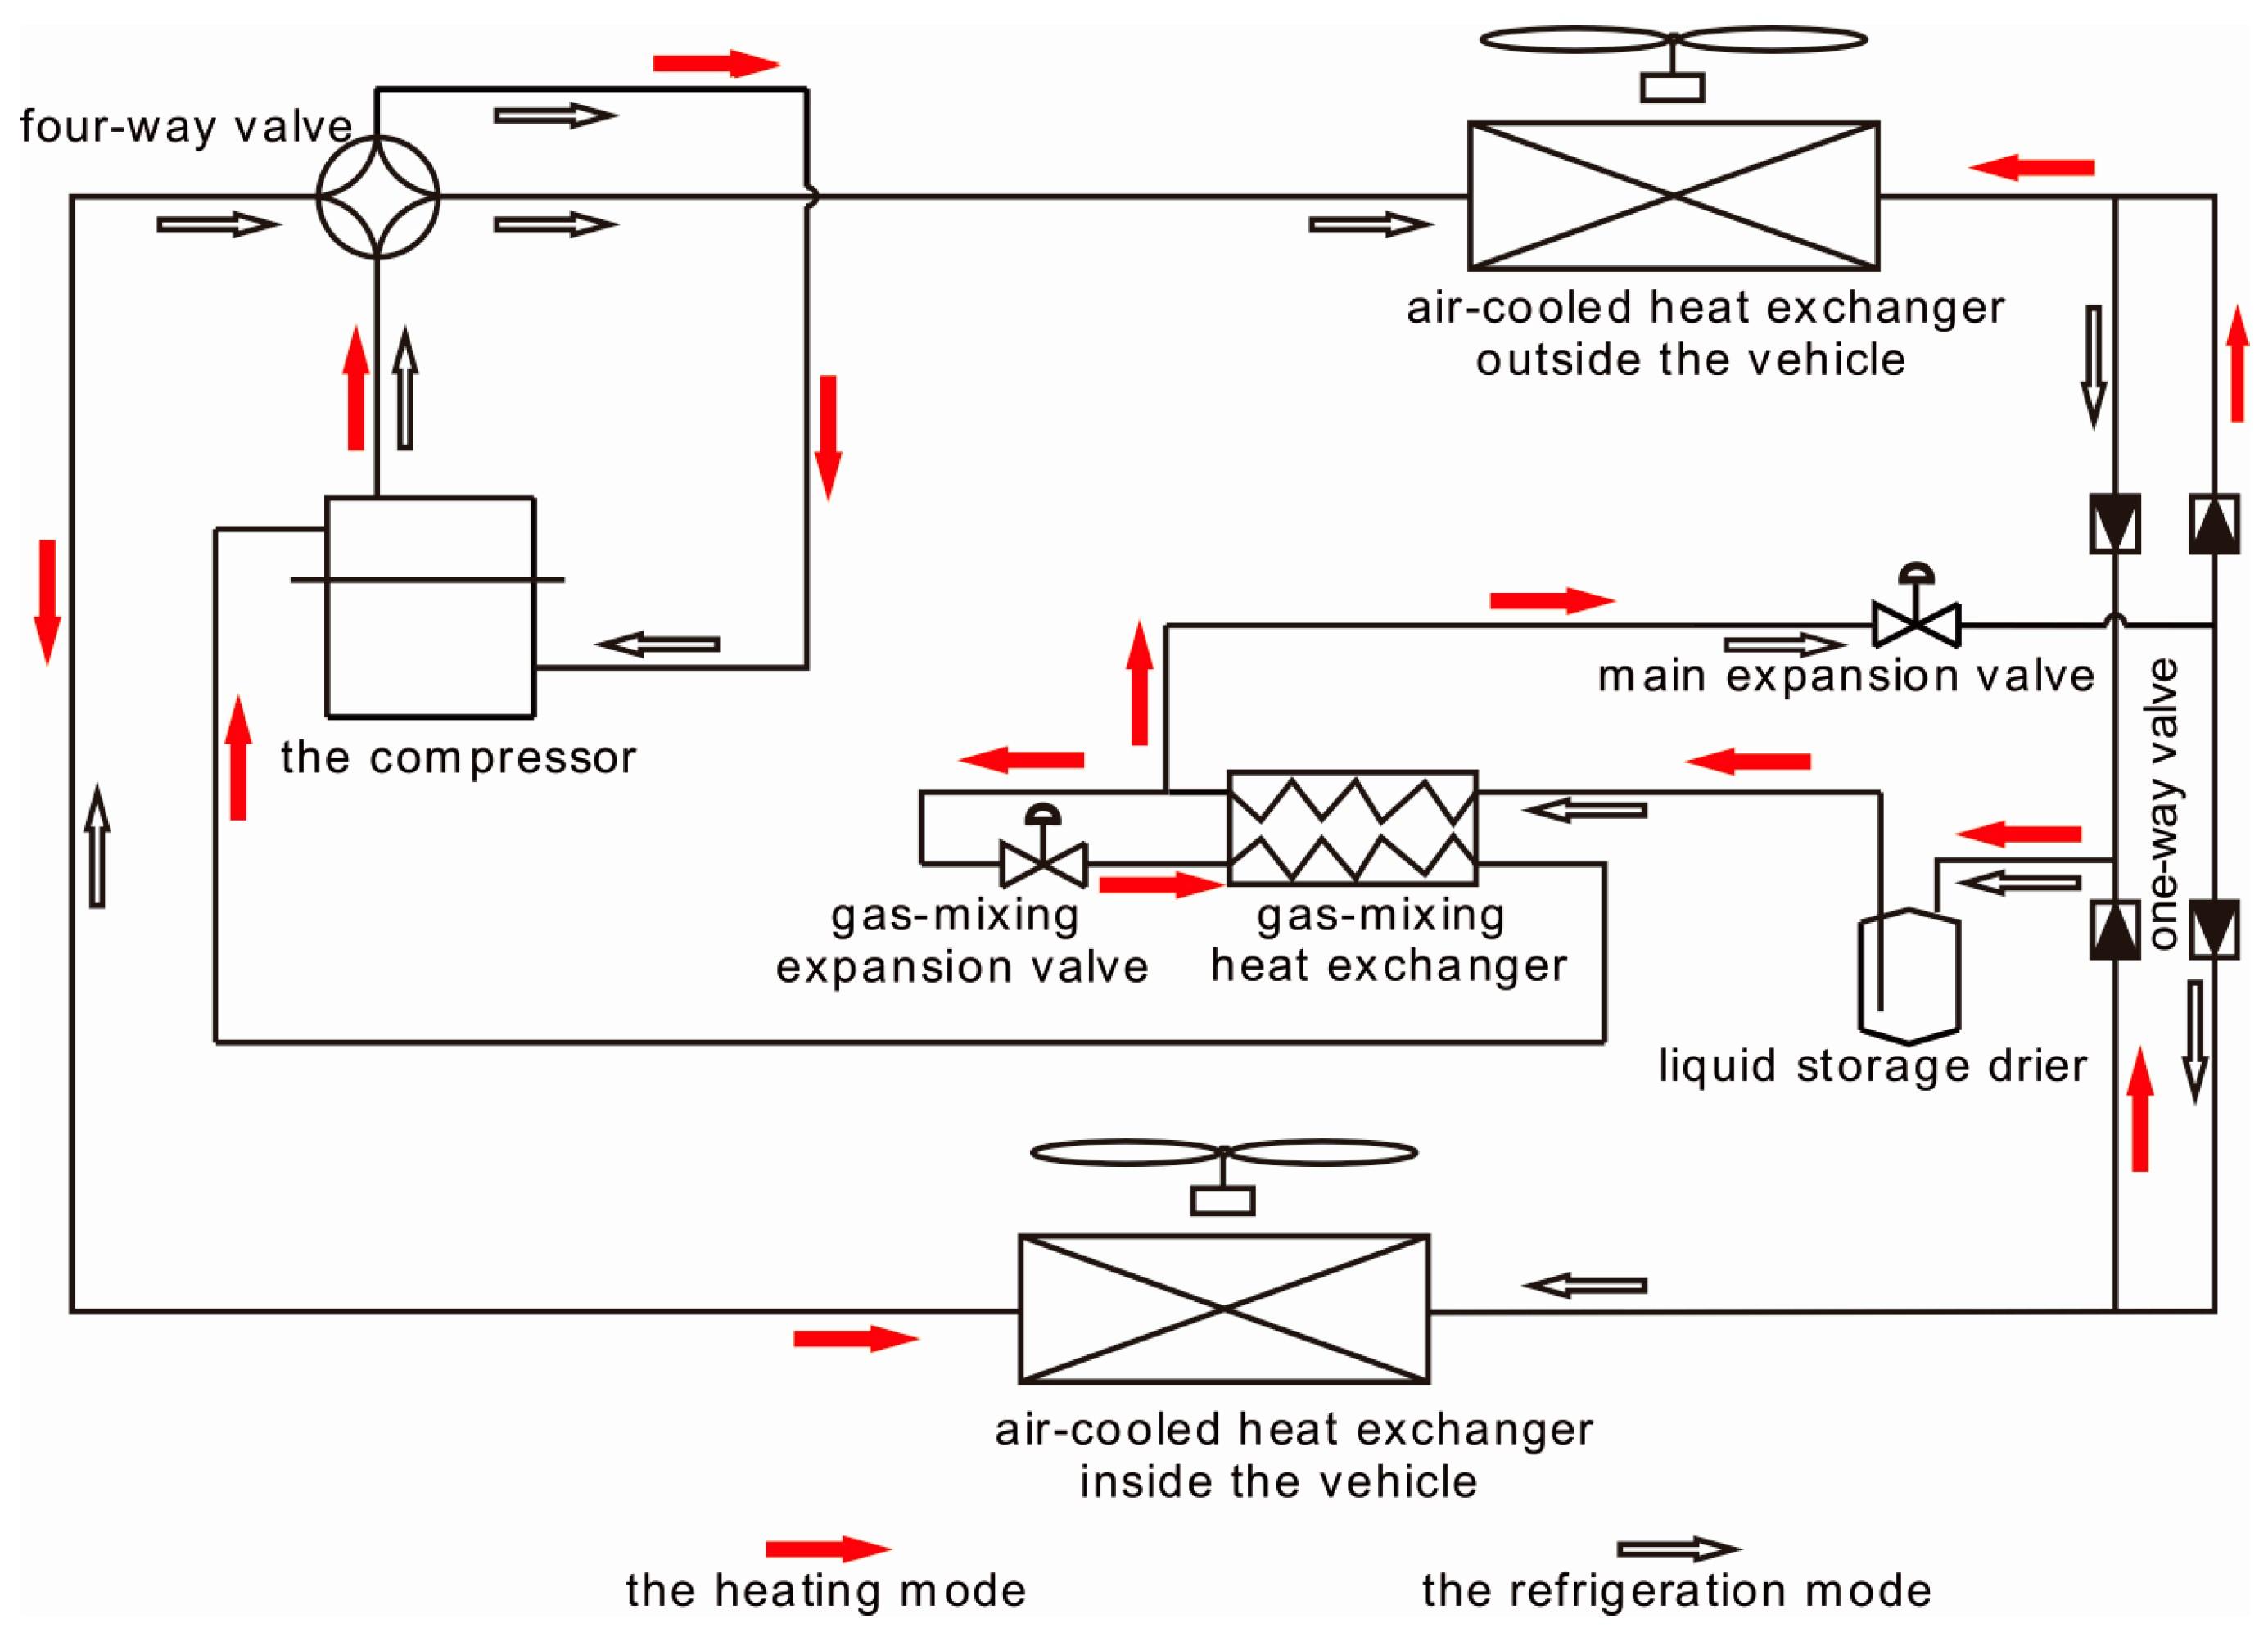 Diagram Of Auto Ac System Energies Free Full Text Of Diagram Of Auto Ac System